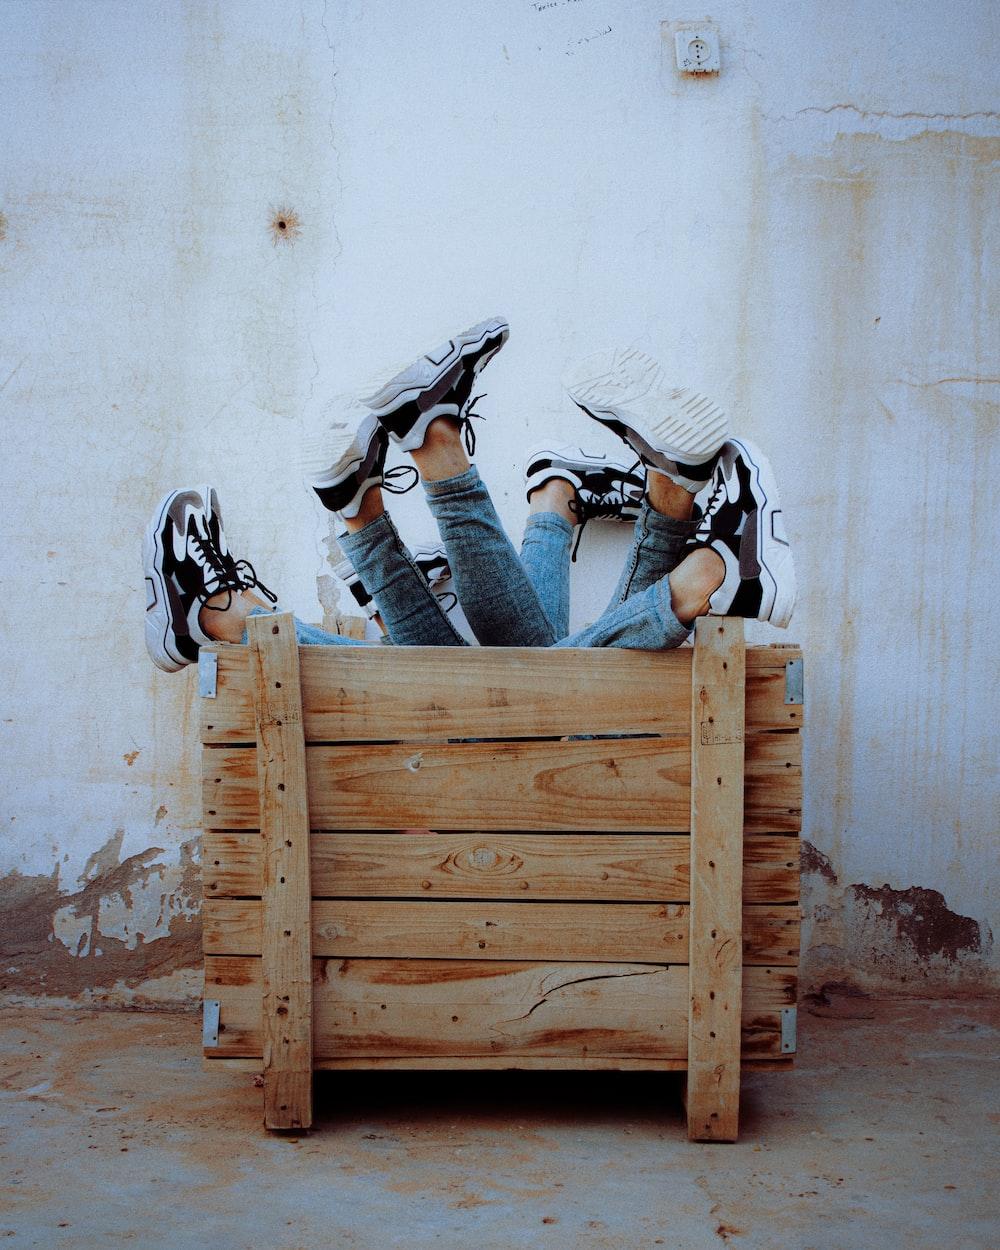 man in blue denim jeans sitting on brown wooden bench